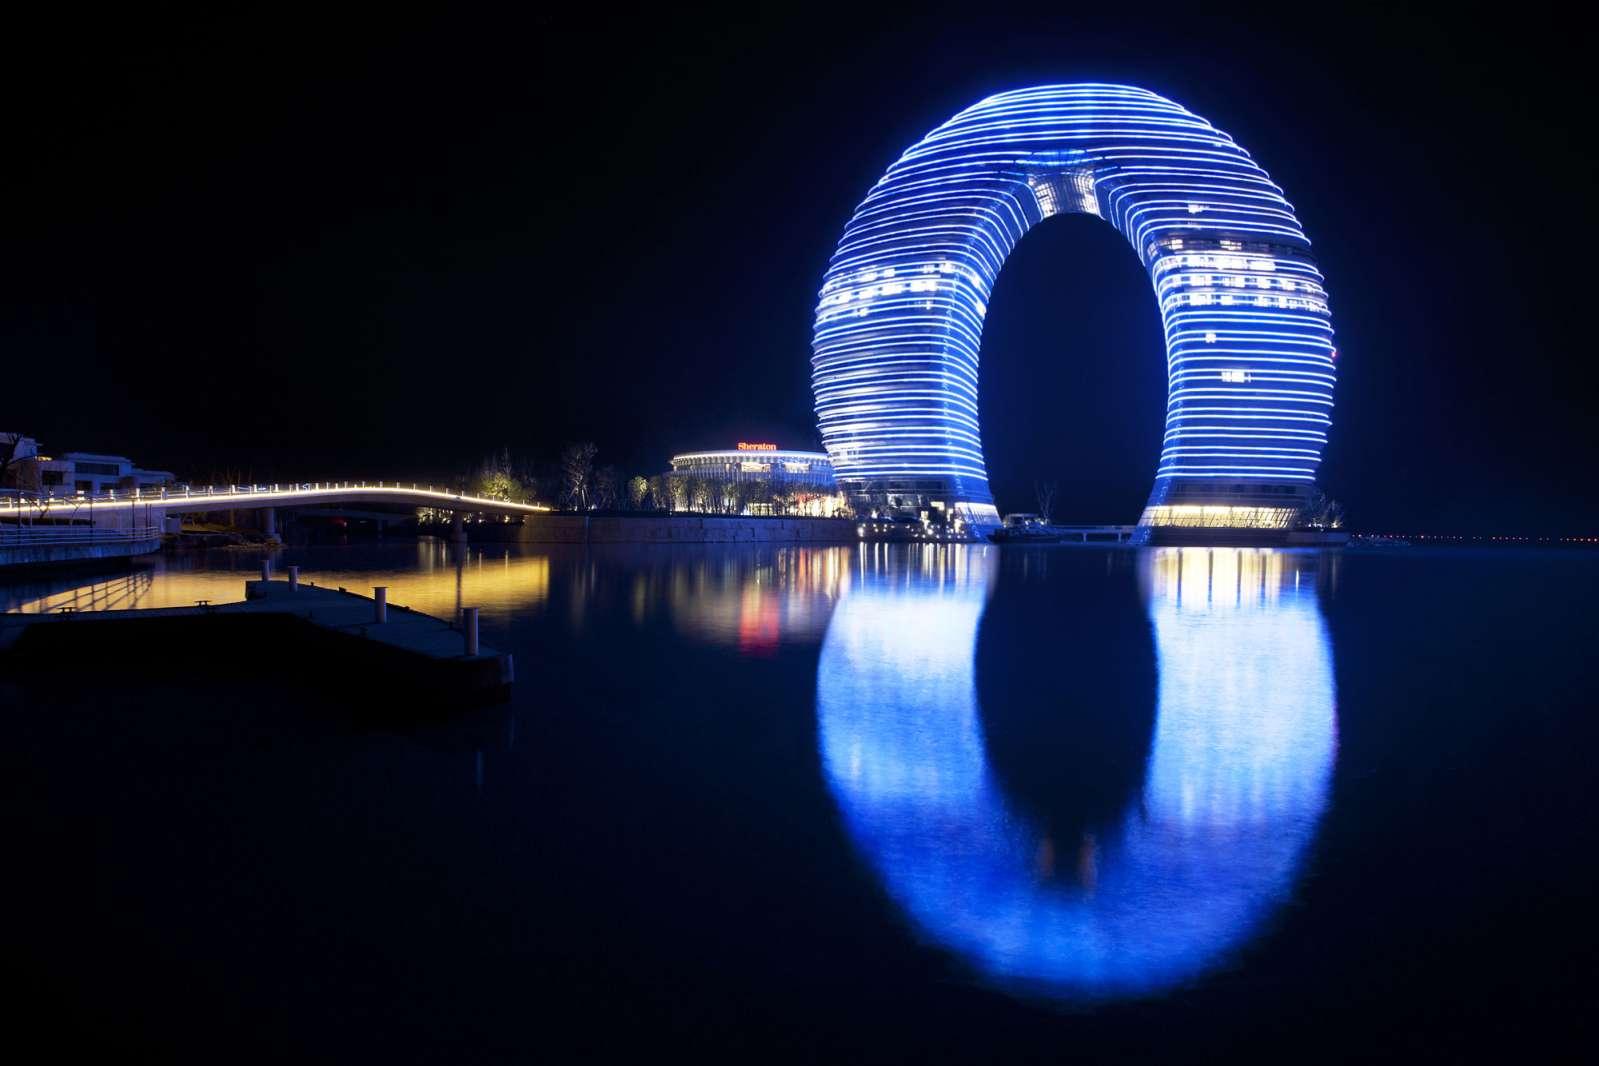 Hotel con forma de anillo